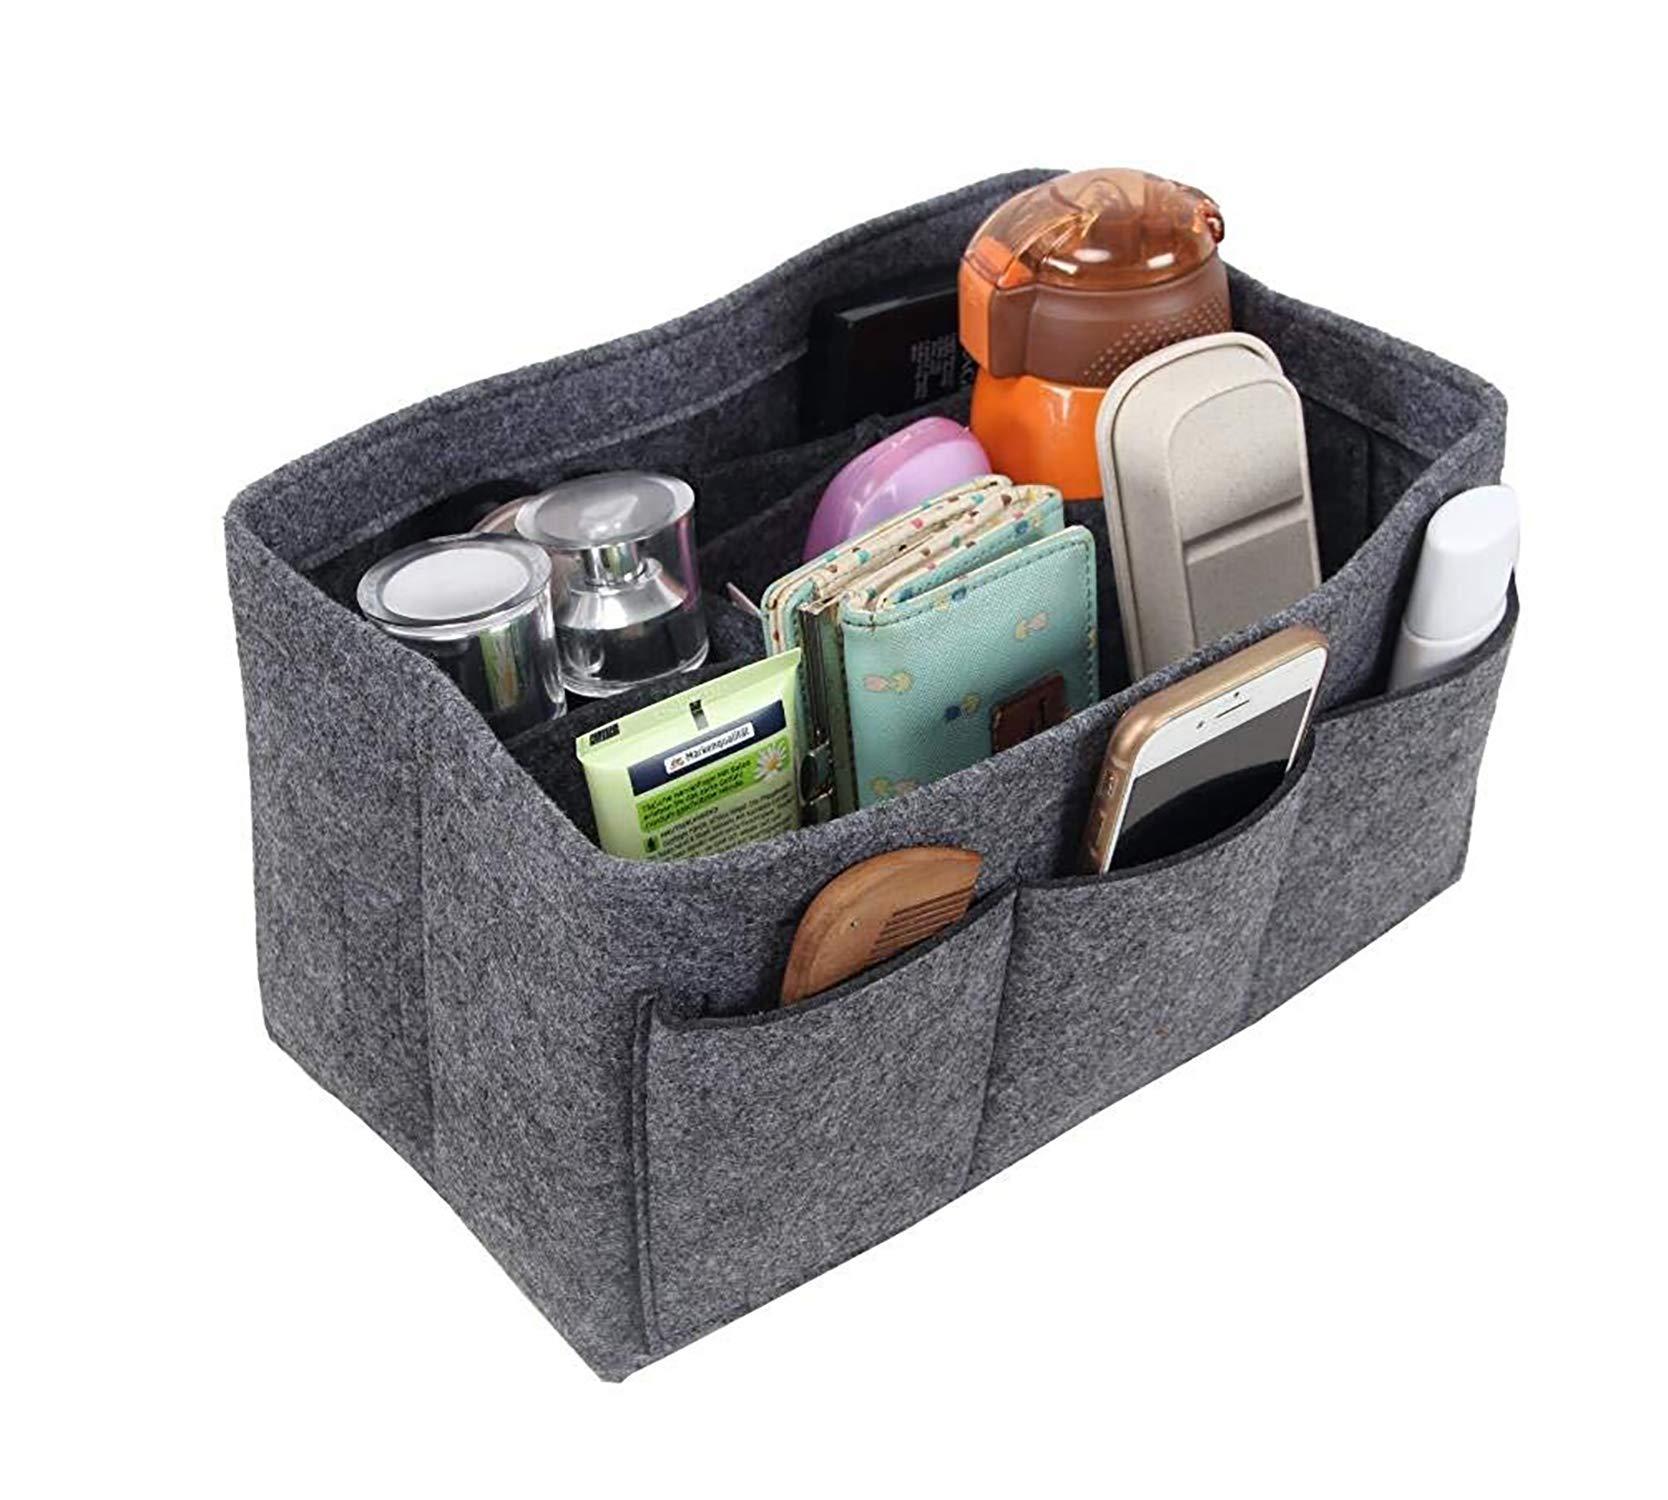 Felt Purse & Bag in Bag Organizer Insert/Multi-Pocket Handbag Shaper-Fit LV Speedy Neverfull Longchamp Tote(S/Grey)